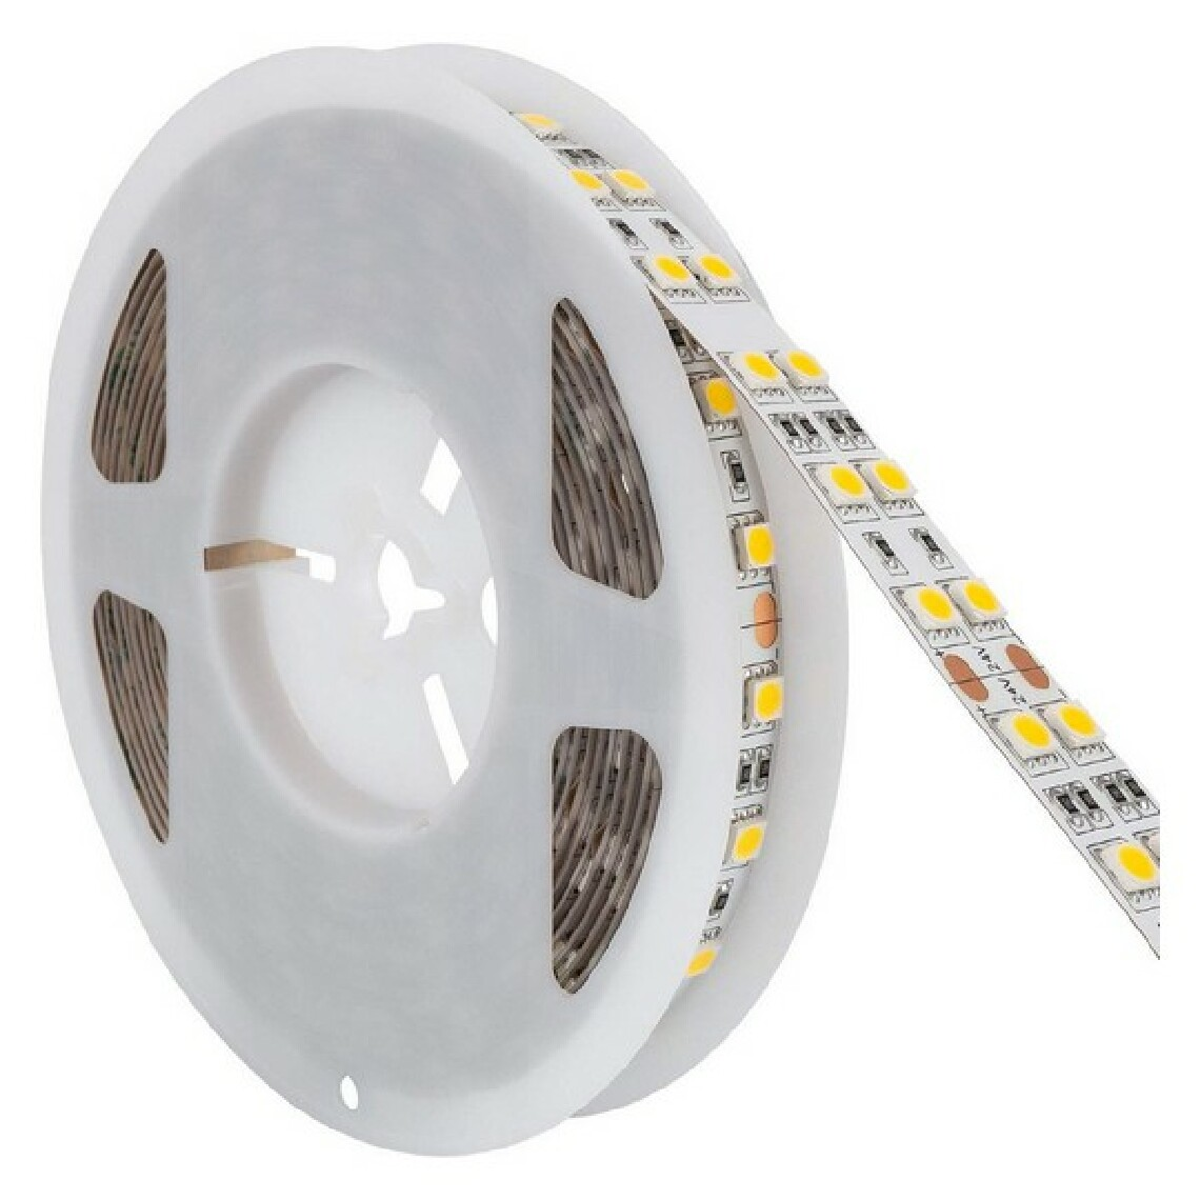 Unknown Bandes LED Ledkia 5 m IP20 A+ 17 W 2640 Lm (Blanc chaud 2800K - 3200K)